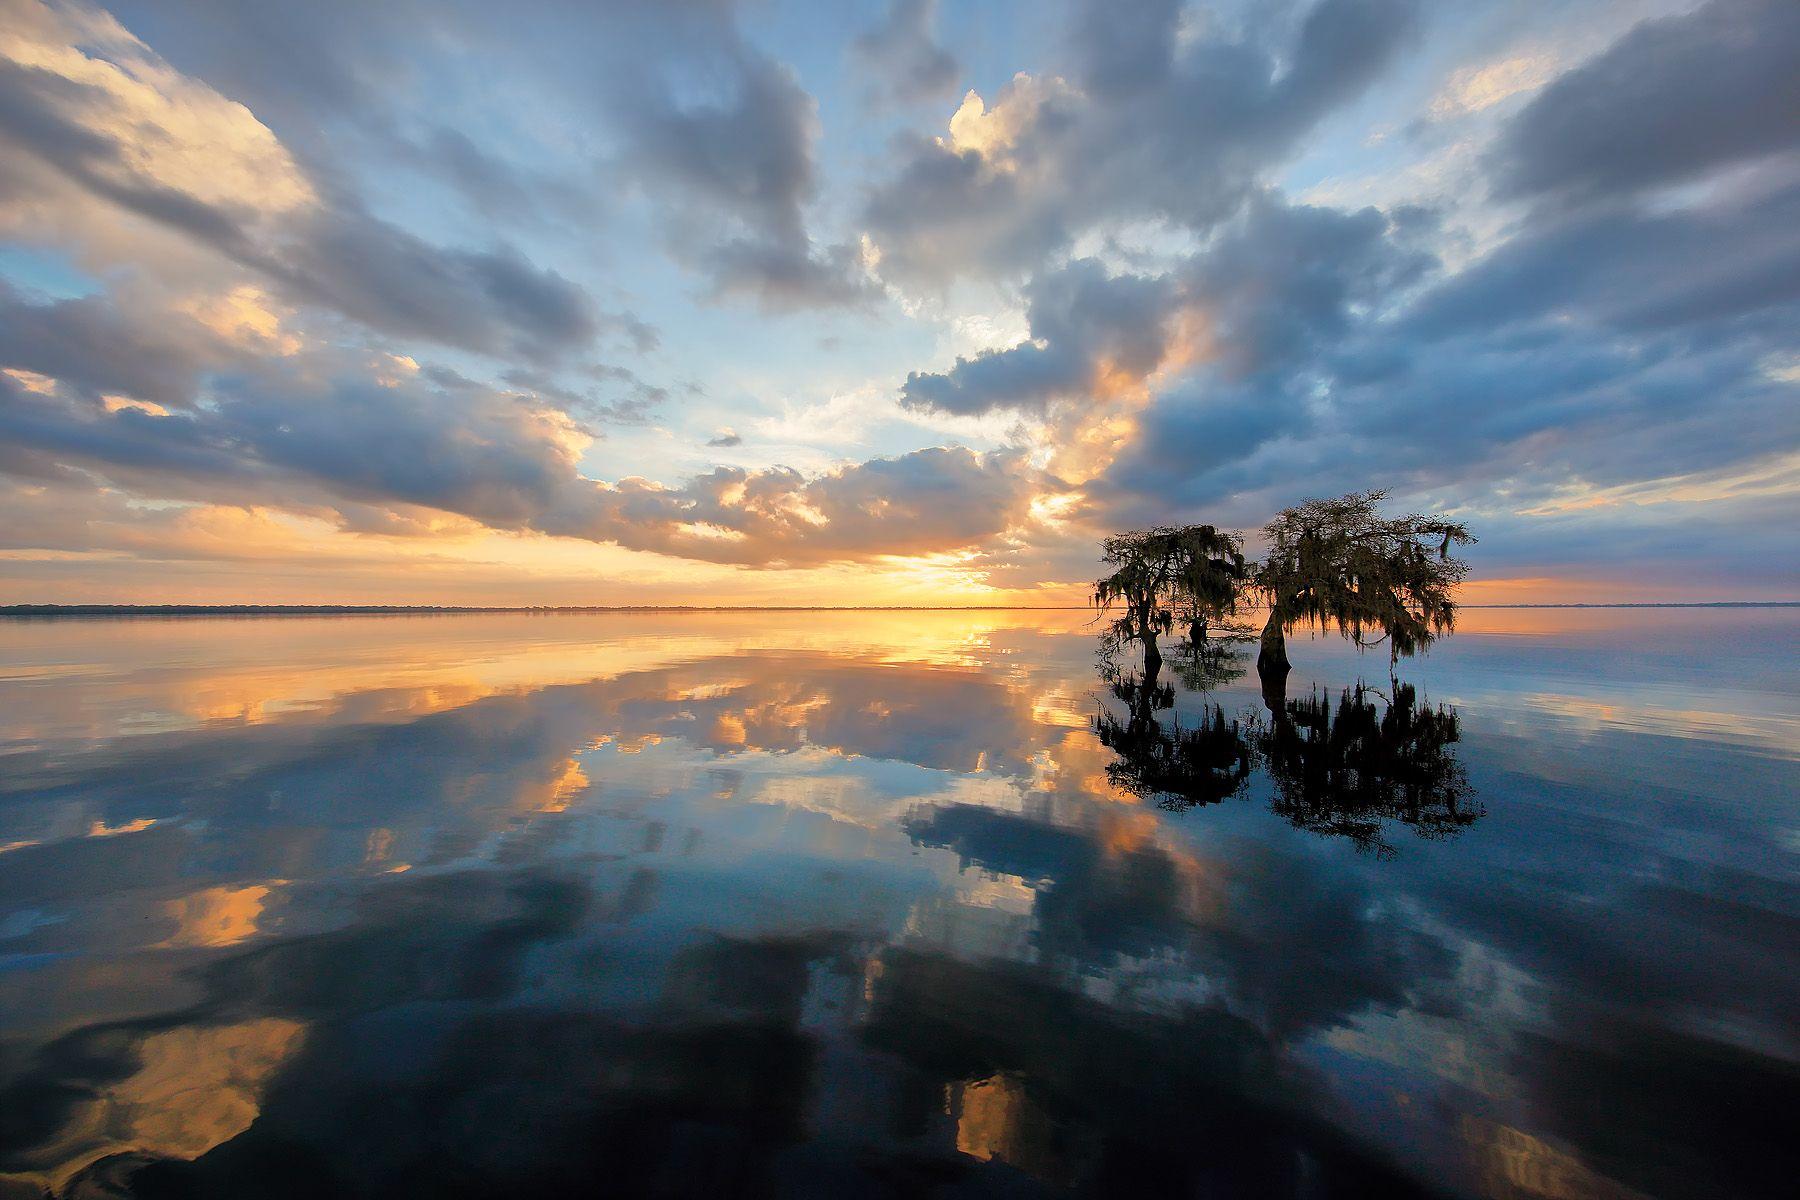 Sunrise at lake Florida